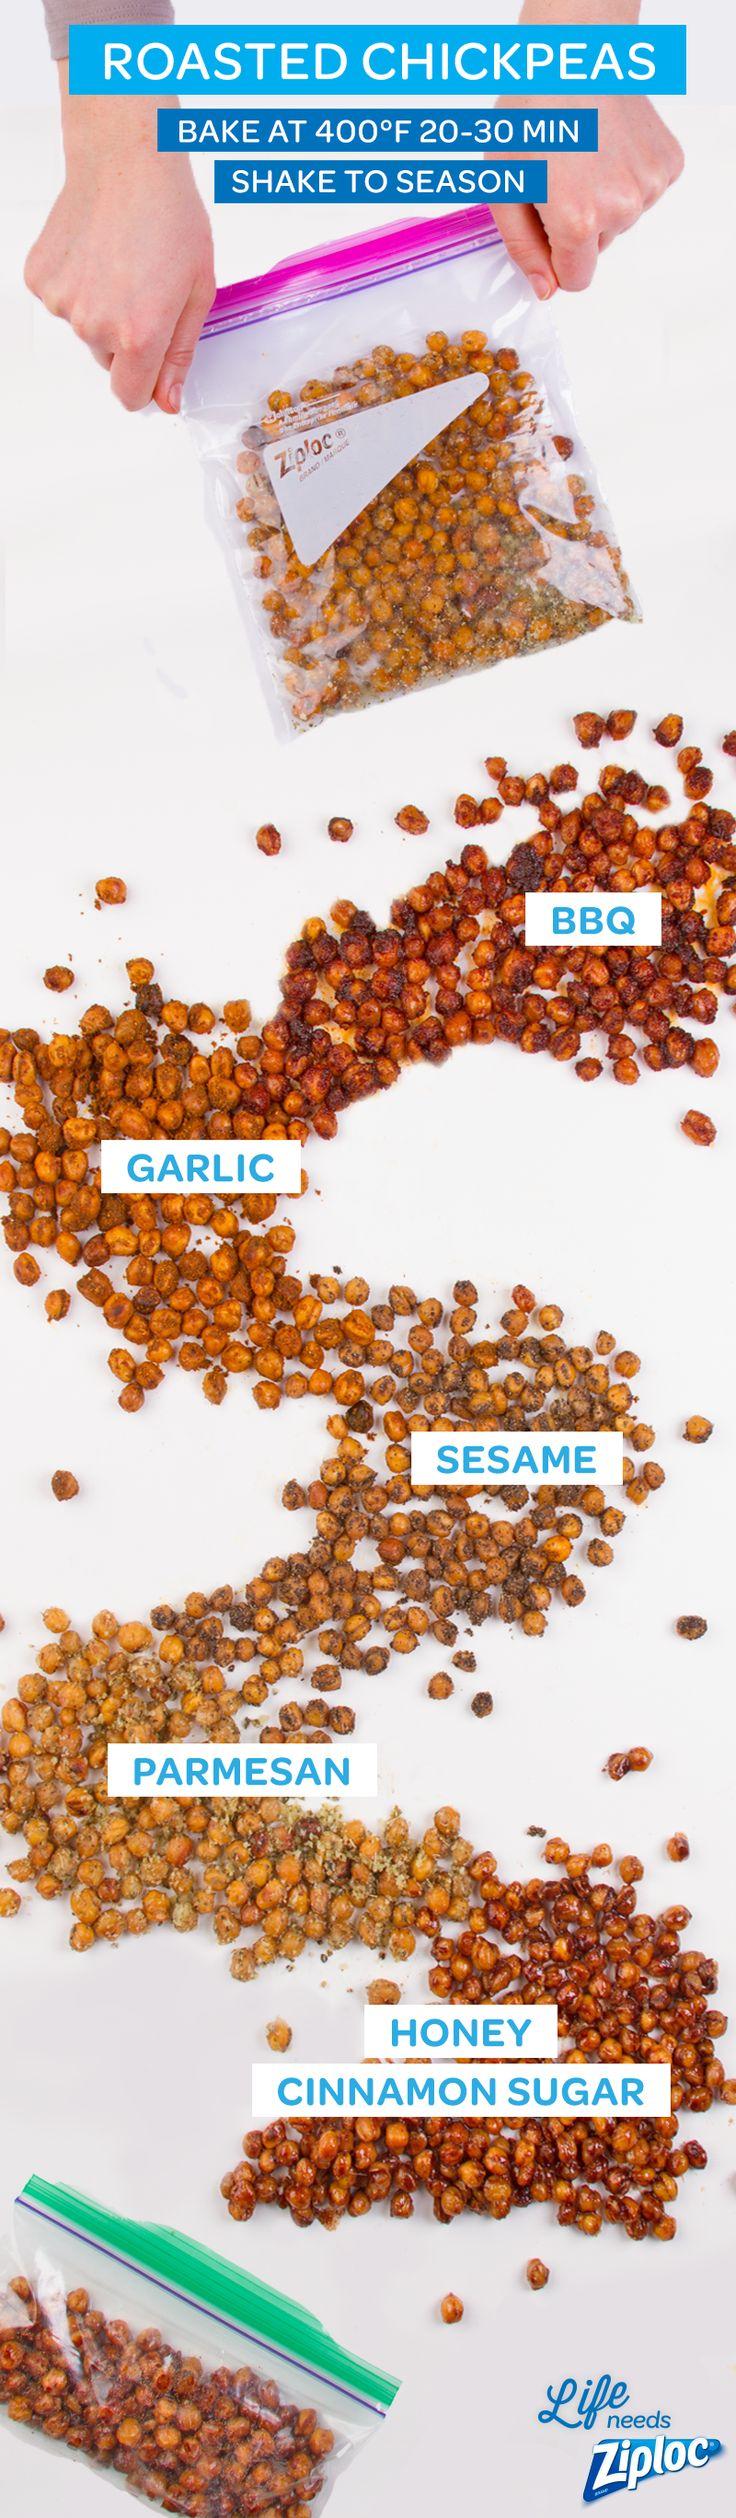 Easy roasted chickpeas are a healthy, crunchy, protein-filled snack. Pack it to go in a Ziploc® snack bag. Recipes: BBQ: 1 tsp paprika, ½ tsp ground cayenne, ½ tsp garlic salt, ½ tsp onion powder, 2 tbsp brown sugar. Garlic: 1 tsp garlic salt, ½ tsp paprika. Sesame: ½ tsp vegetable oil, ¼ tsp garlic powder, 2 tsp soy sauce, 1 tbsp sesame seeds. Parmesan: ¼ c parmesan cheese, 1 tbsp olive oil, ¼ tsp oregano, ½ tsp black pepper. Honey Cinnamon: 2 tbsp honey, 1 tbsp brown sugar, ½ tsp cinnamon.